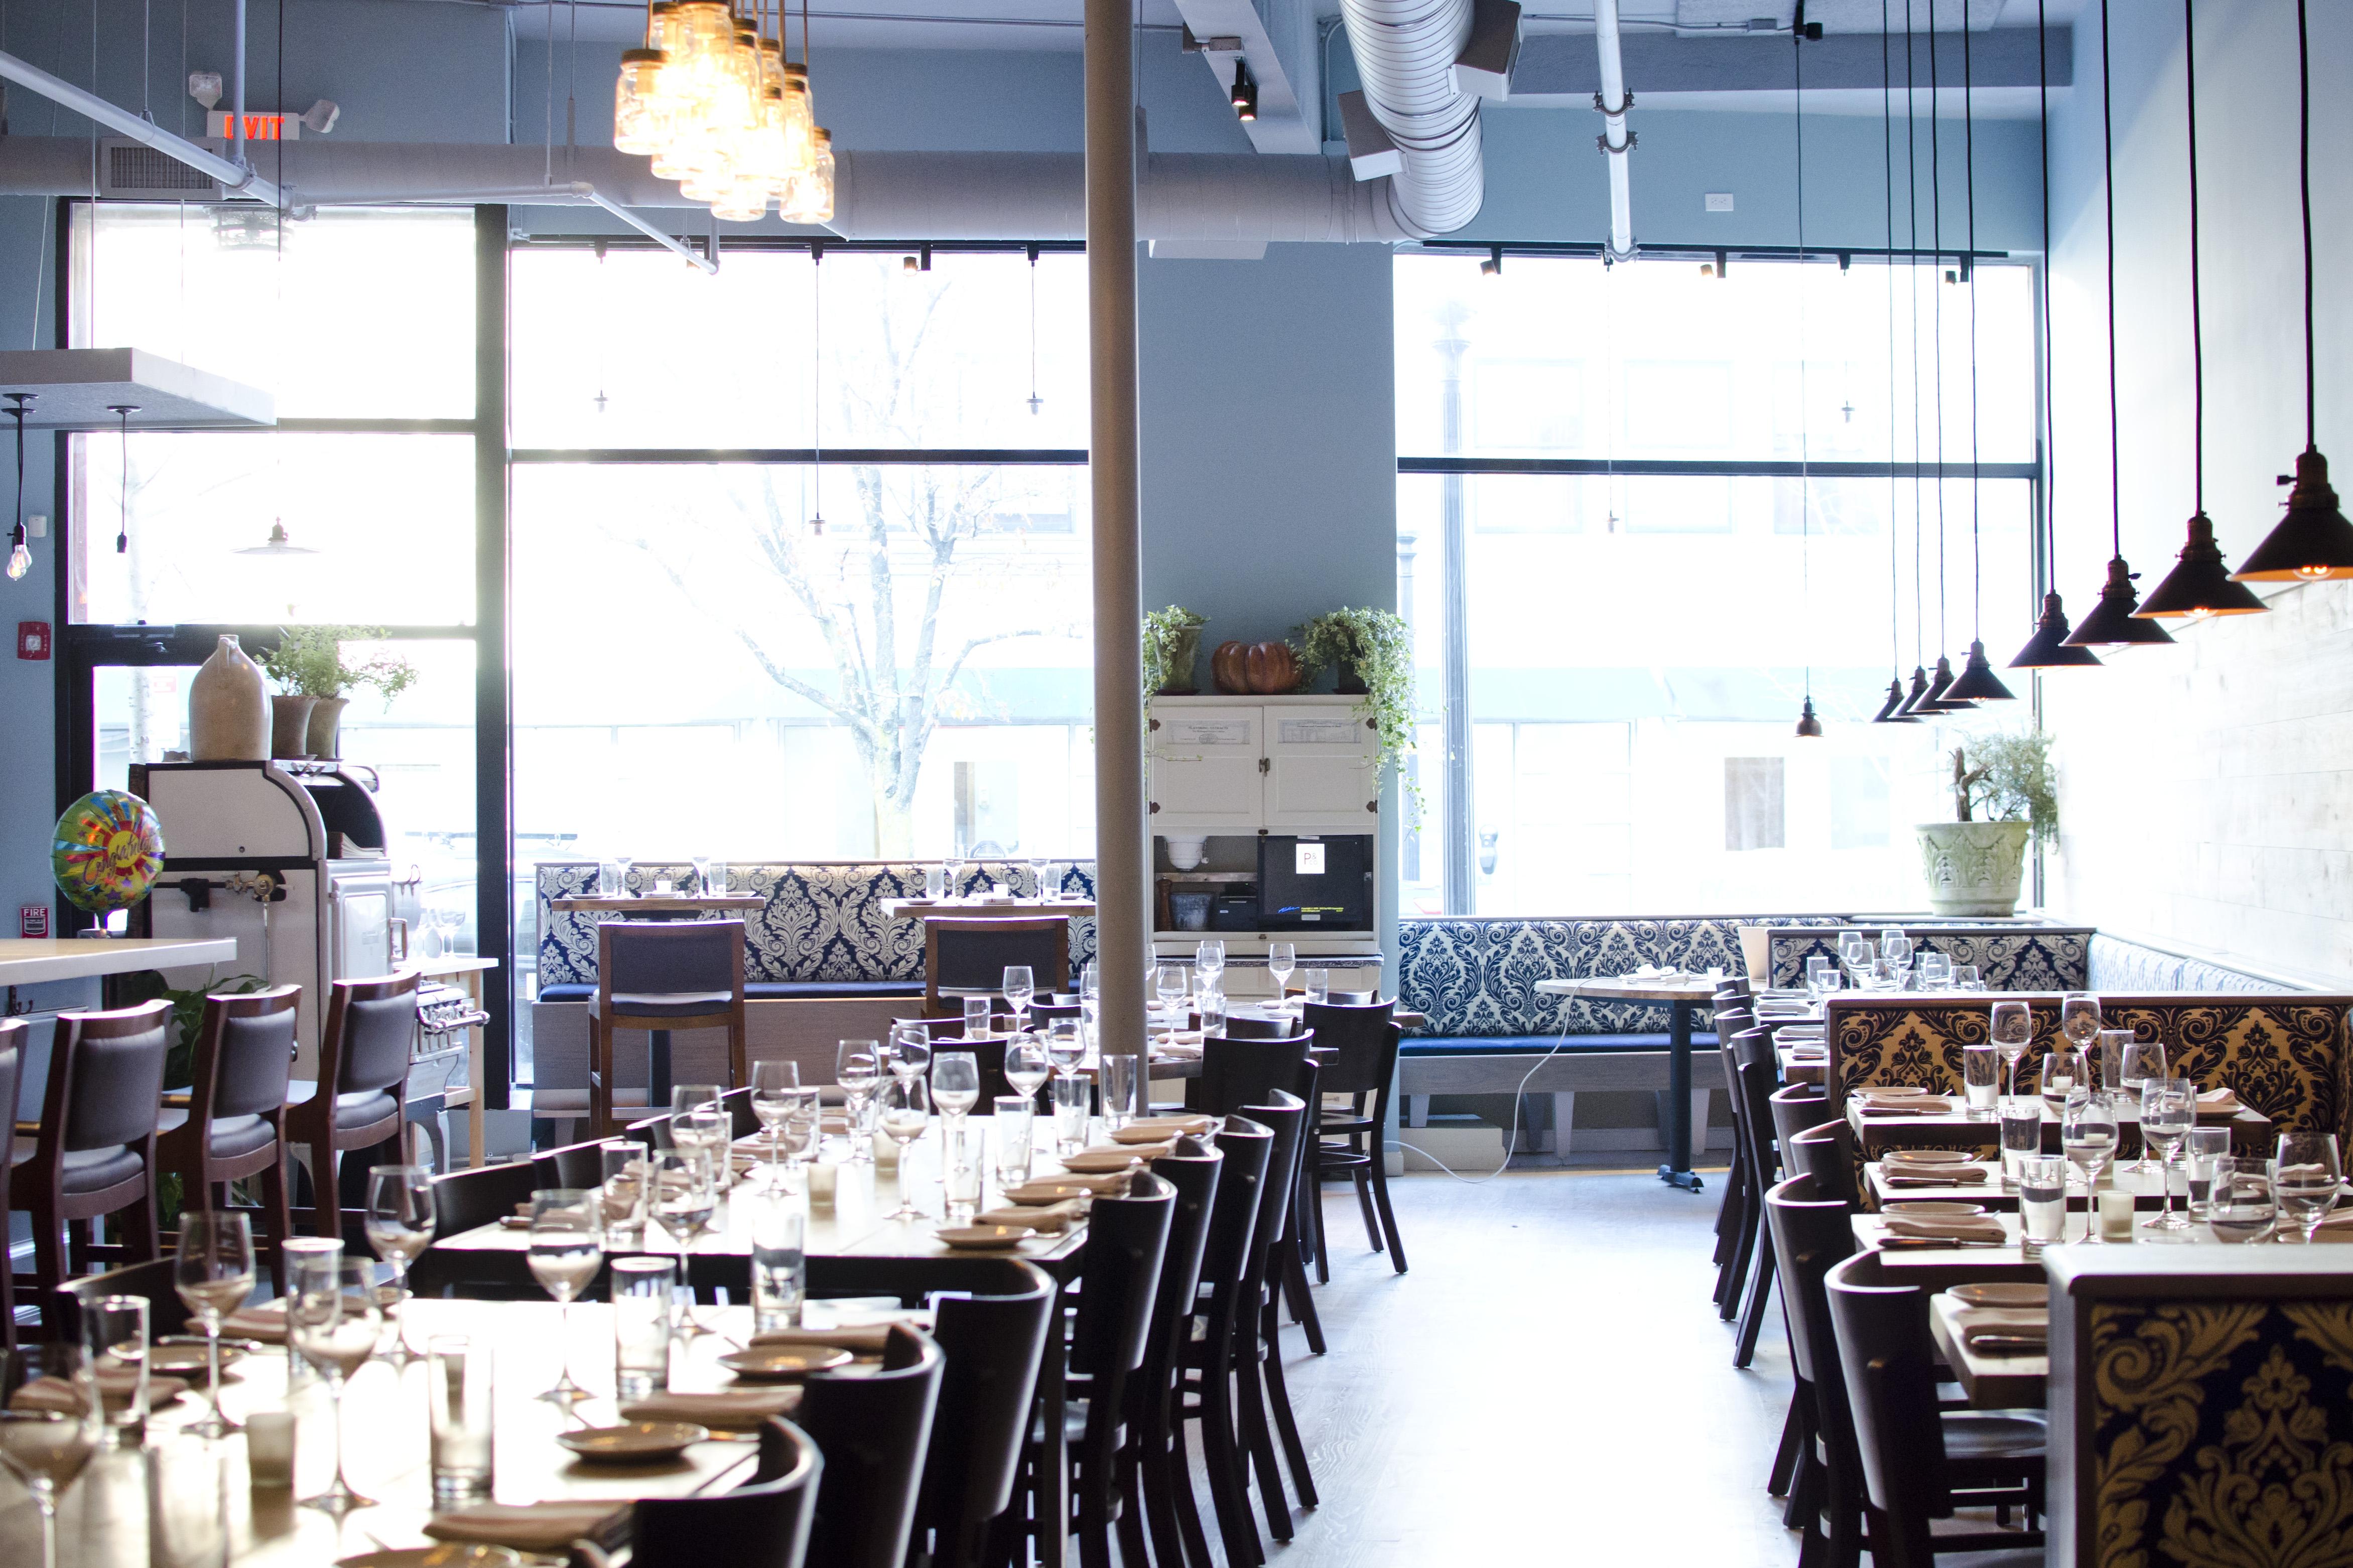 Eat Peacefully at These Quiet Boston Restaurants - Eater Boston